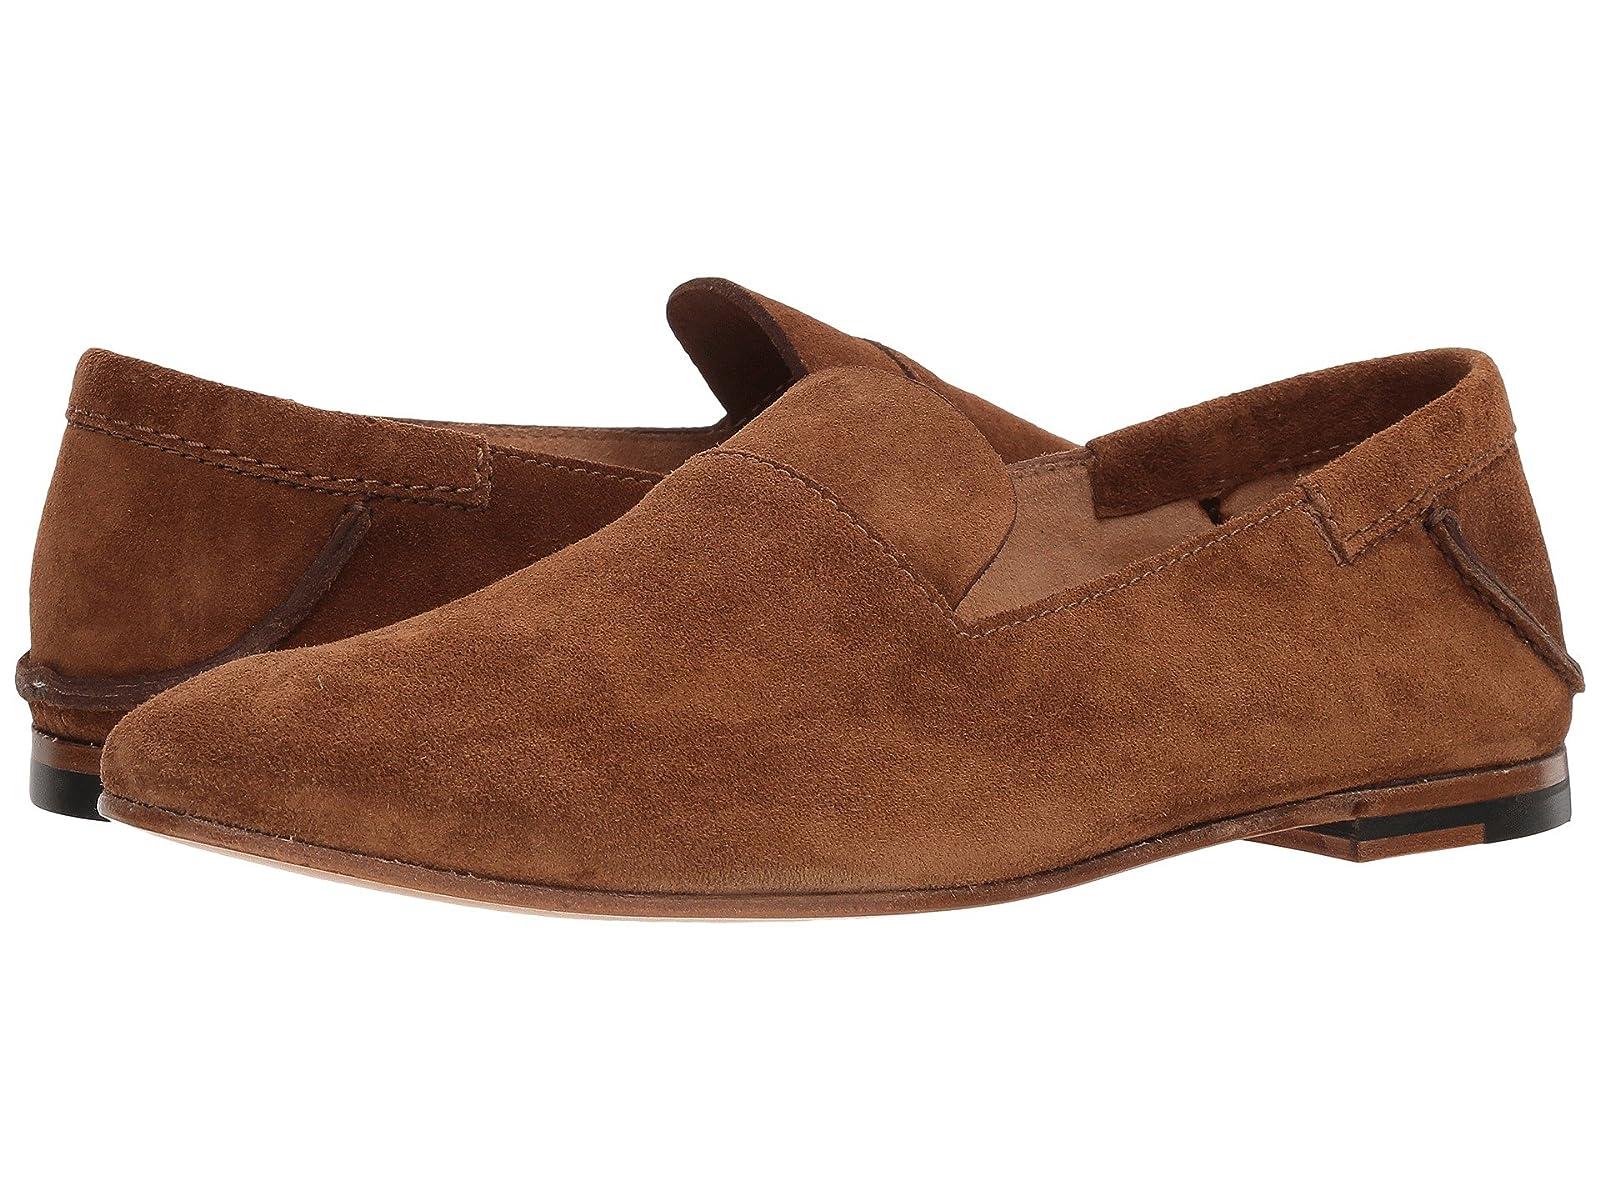 Paul Andrew Ellis Suede Slip-OnAtmospheric grades have affordable shoes